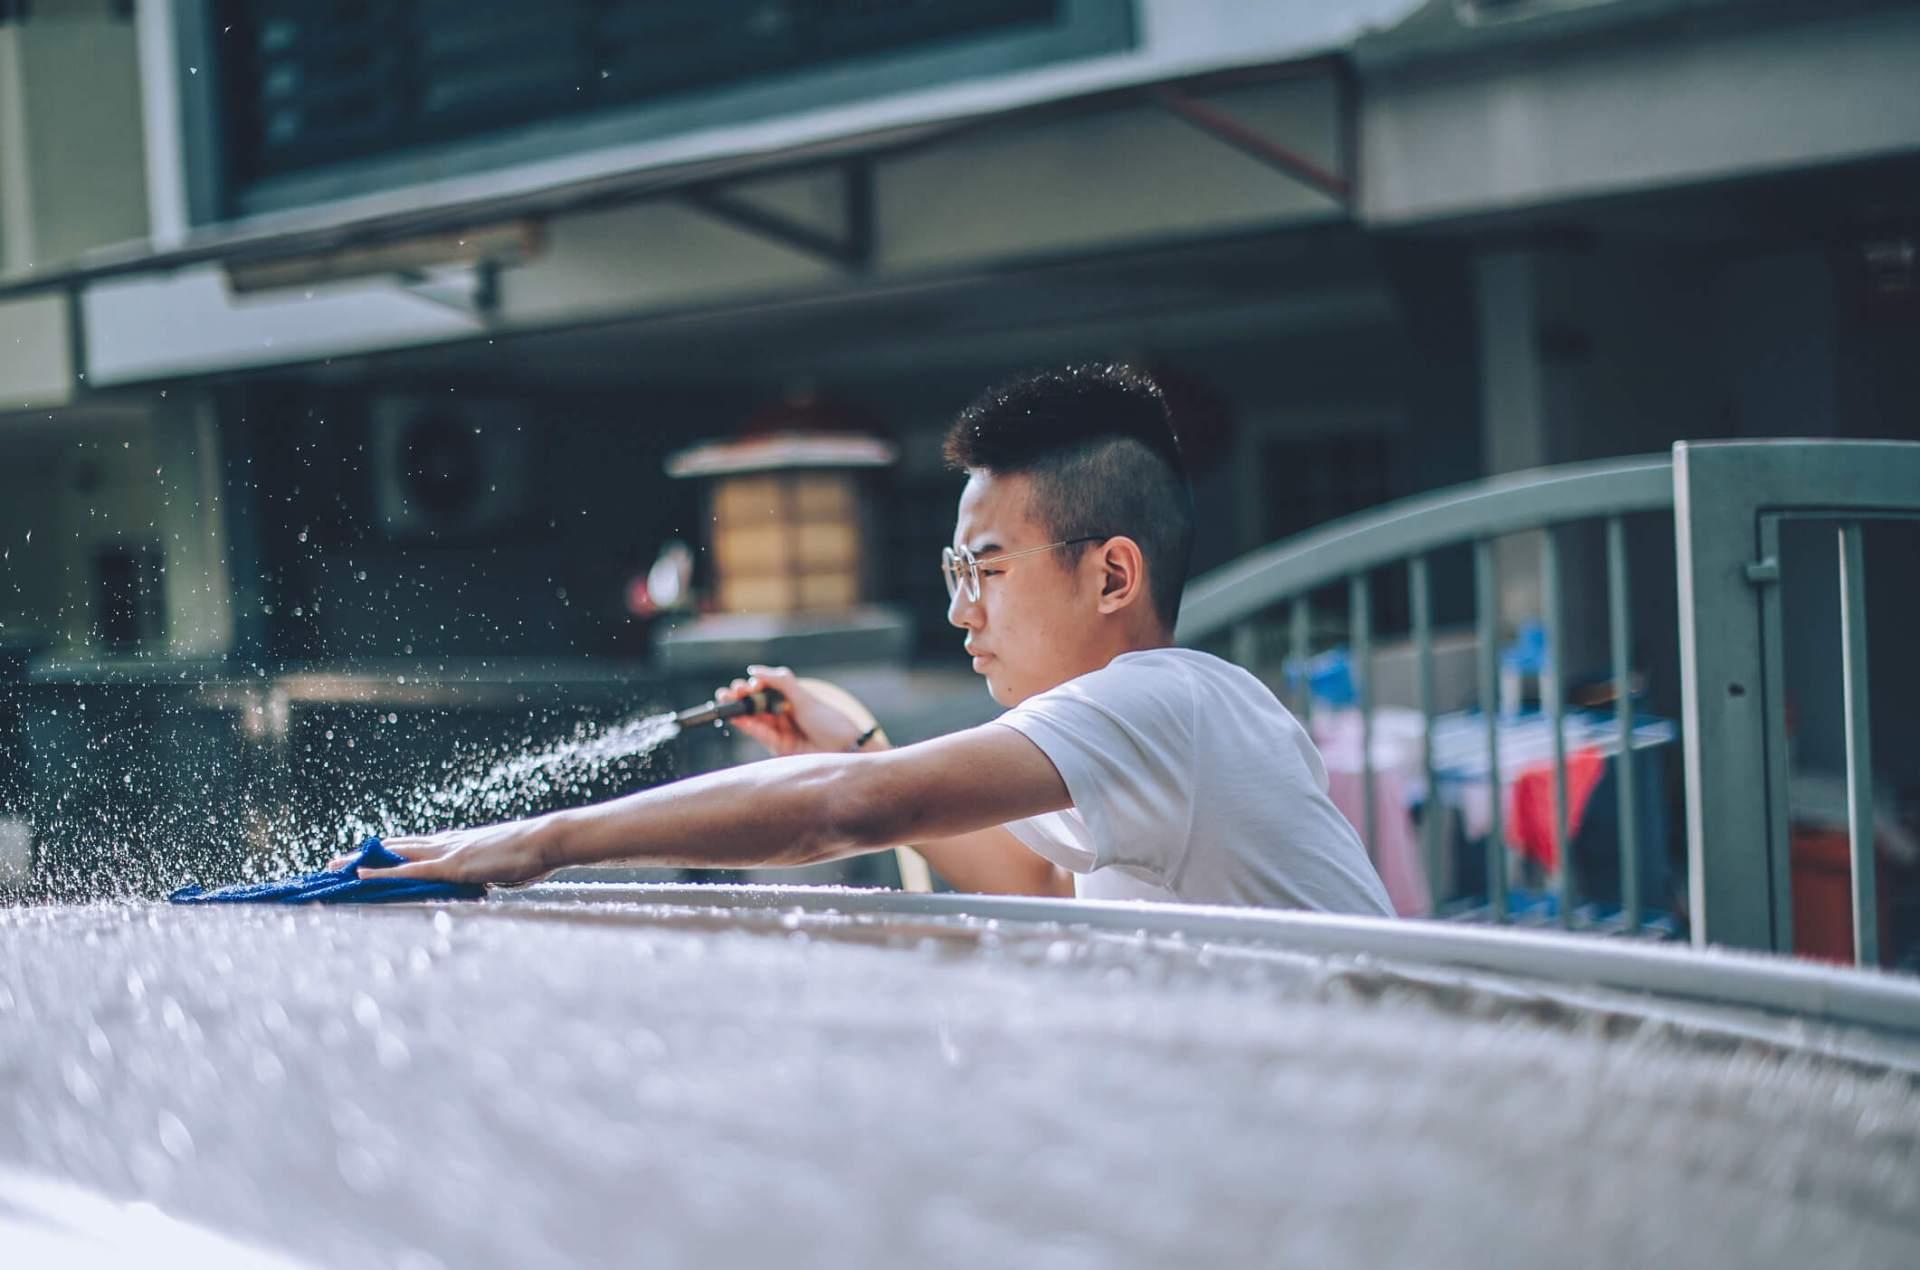 A teenager washing his parents car